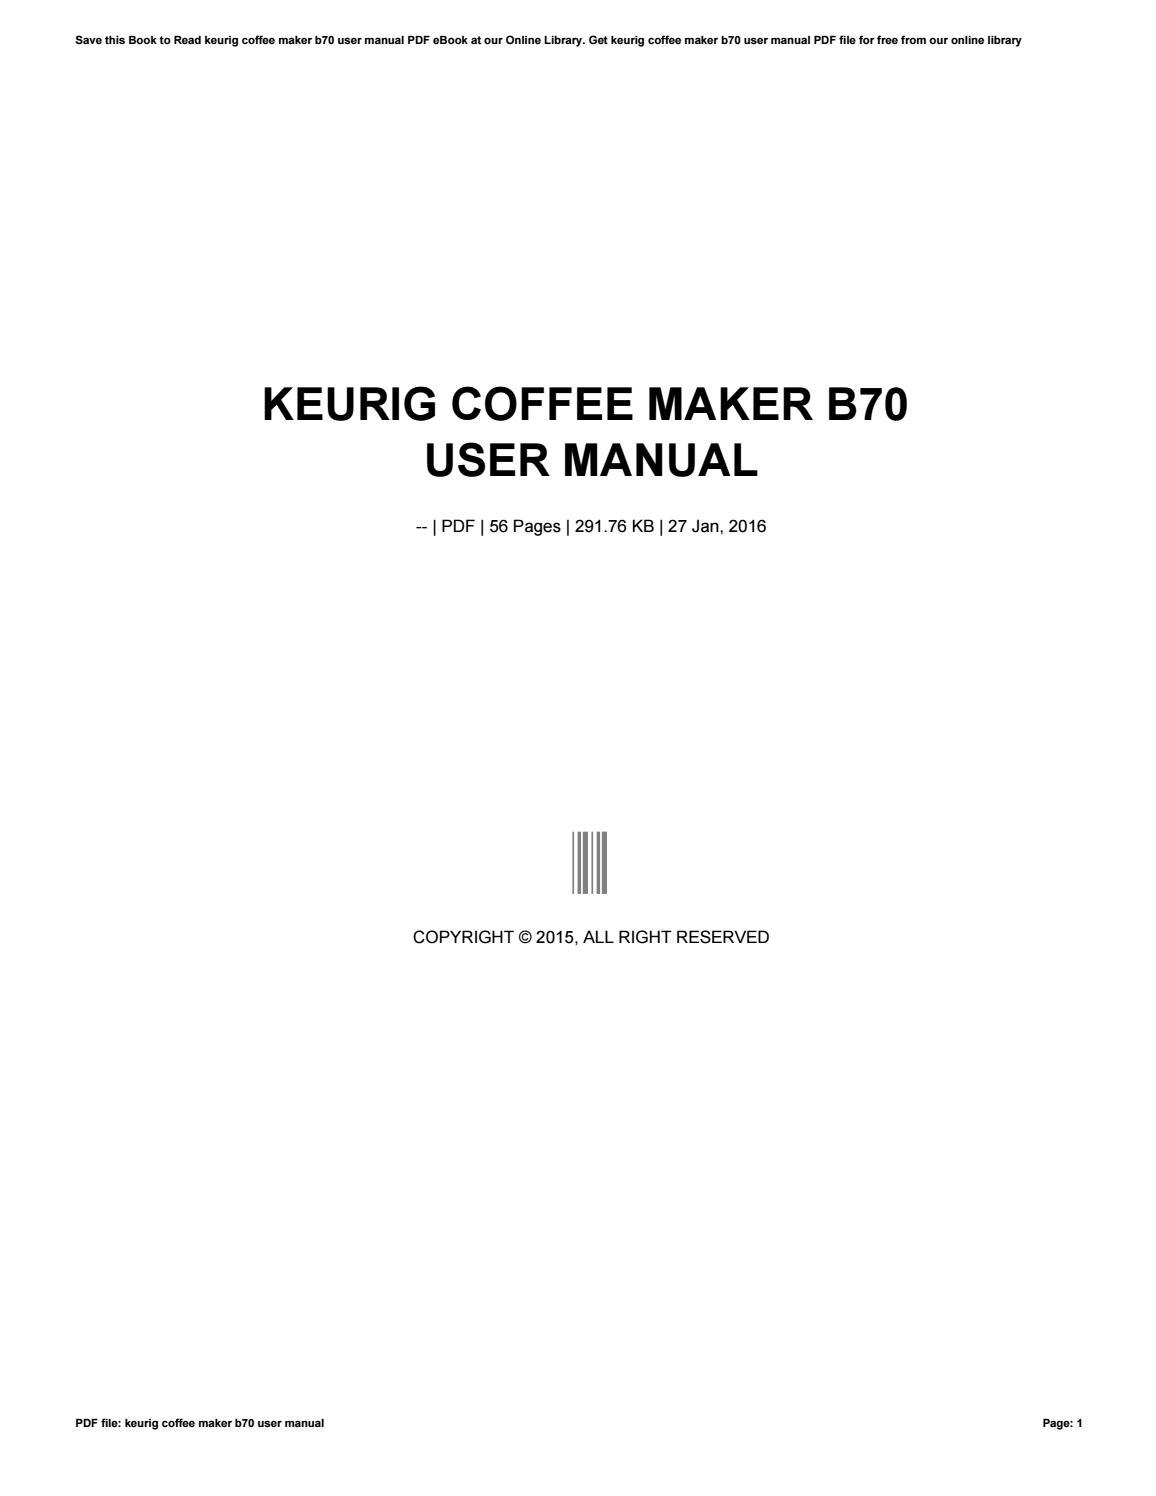 Attractive Keurig Parts Diagram Wiring Bunn Coffee Maker Fullsize Of Manual